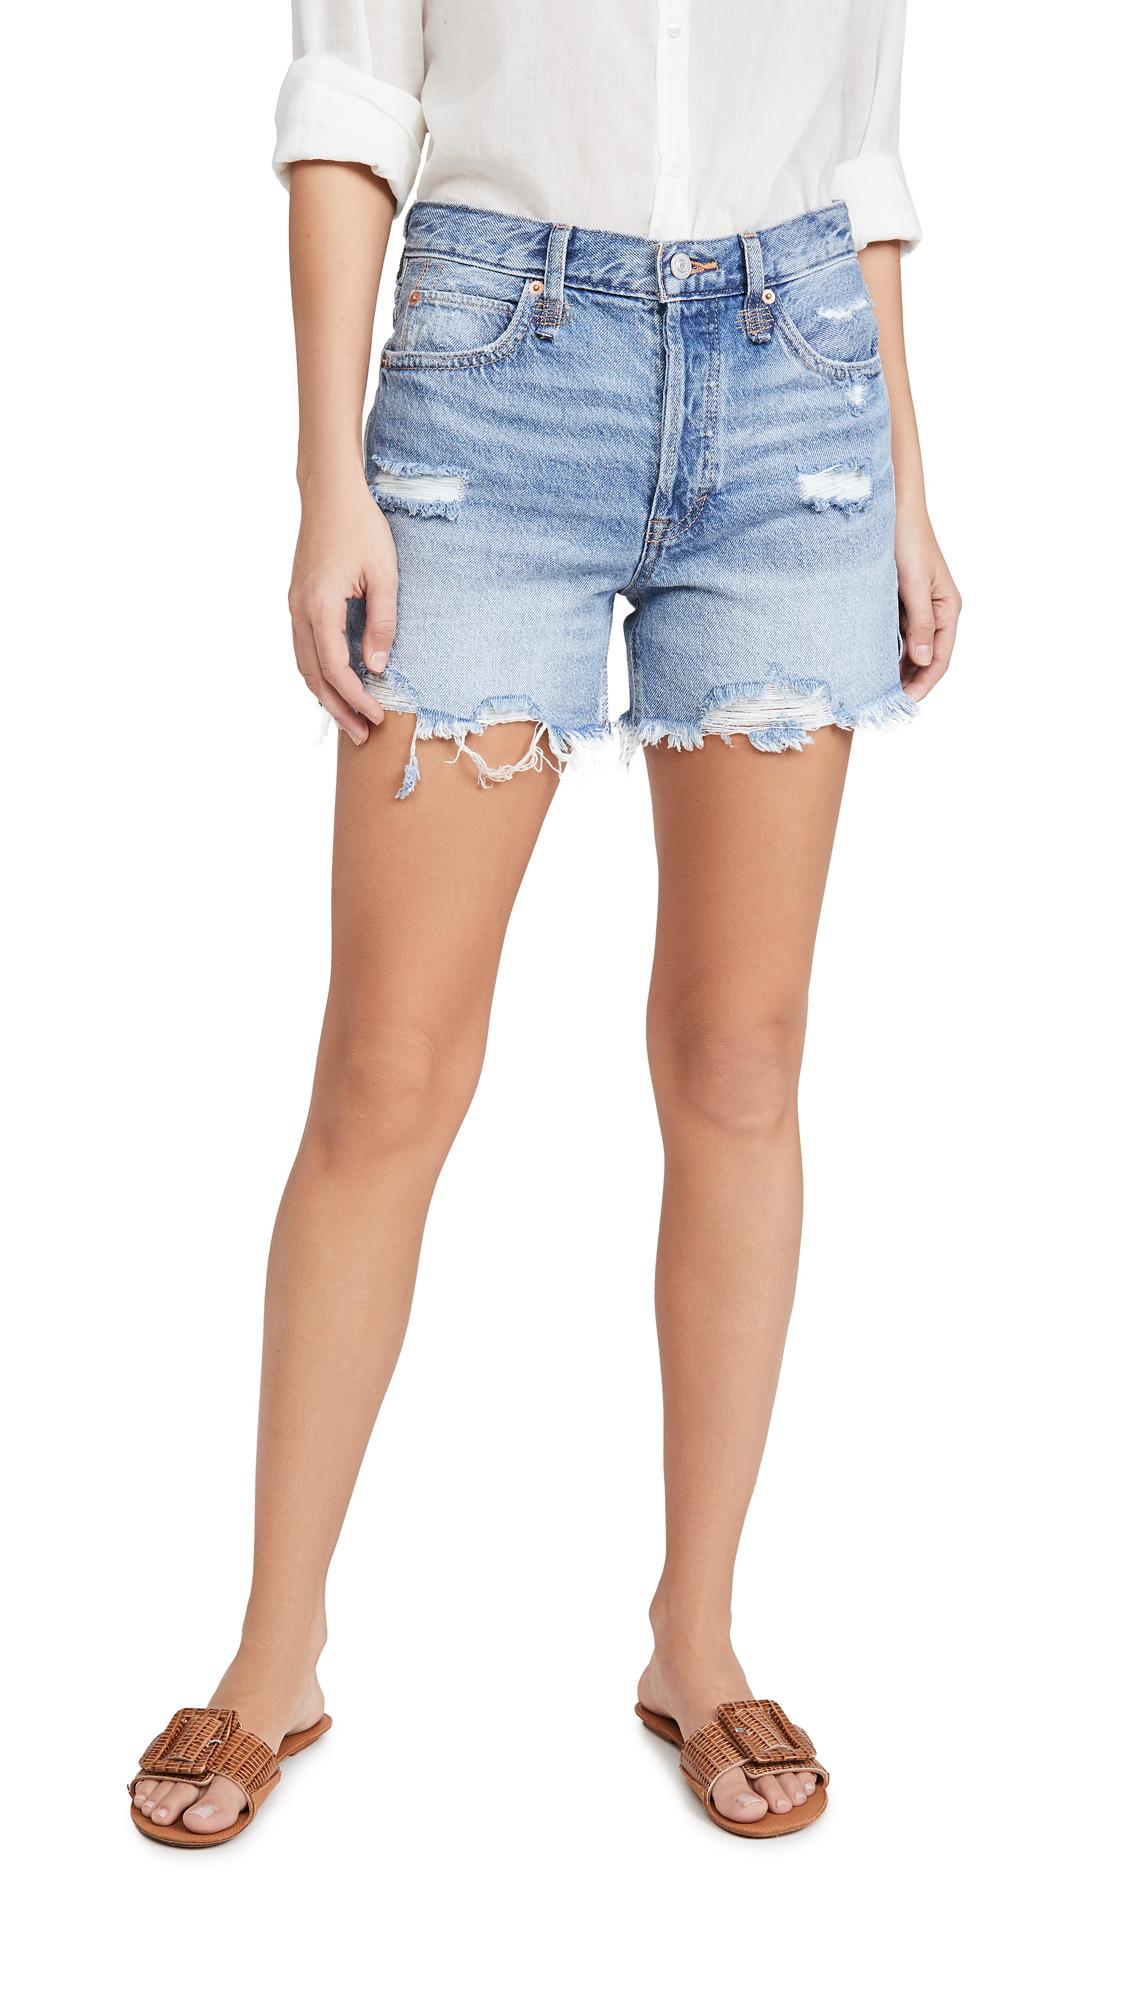 Free People Makai Cutoff Jean Shorts